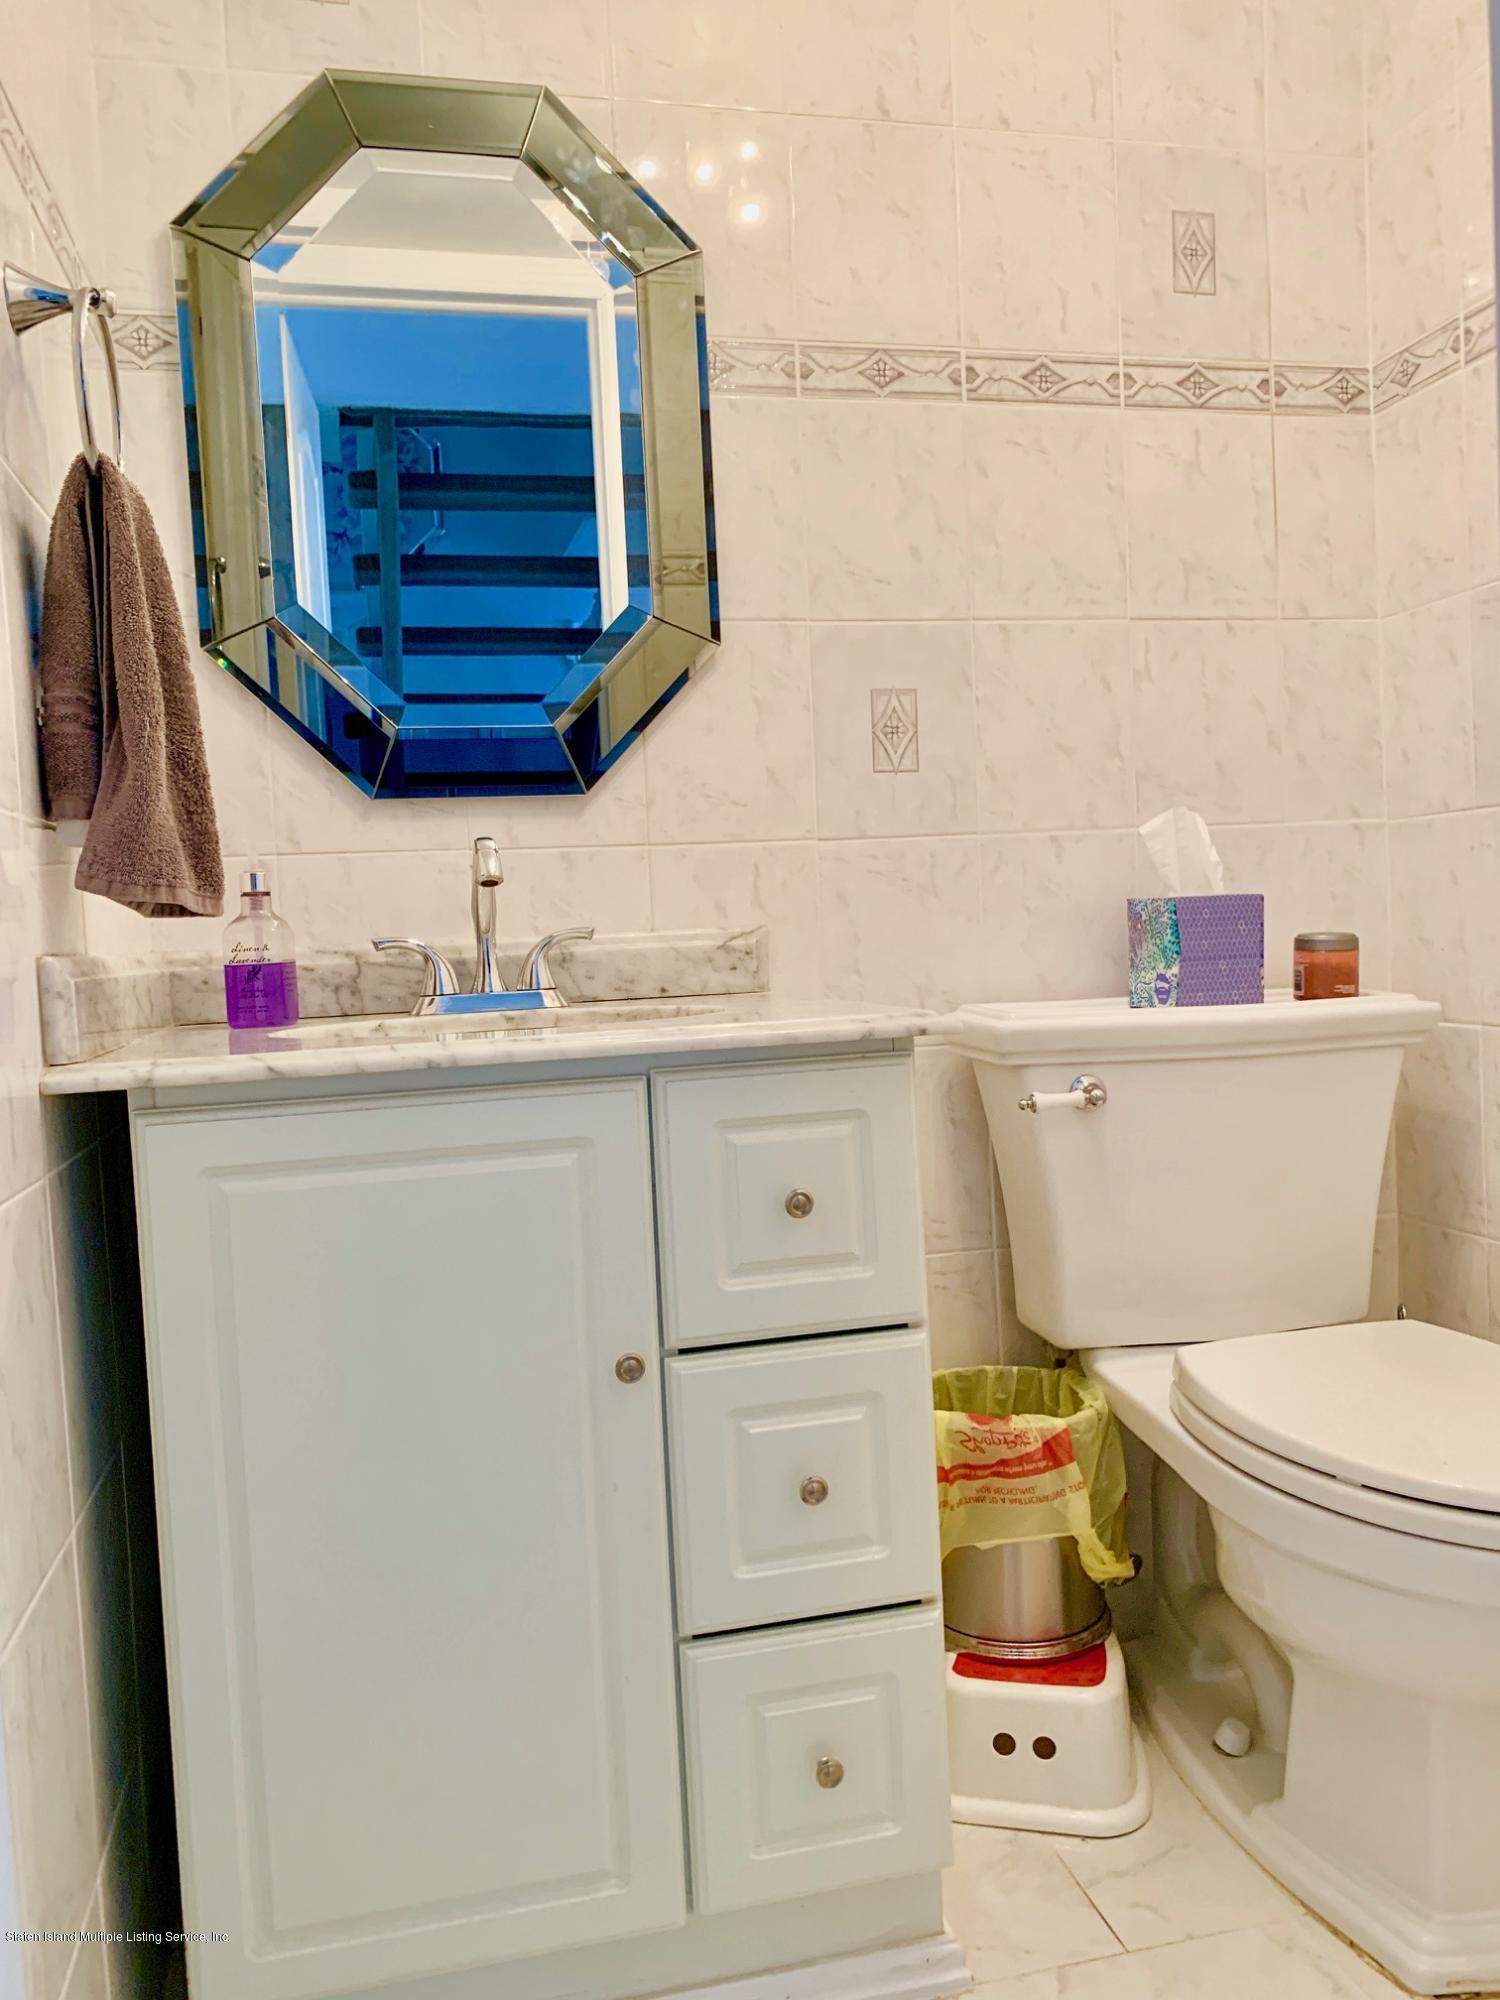 99 Cedar Grove Staten Island,New York,10306,United States,3 Bedrooms Bedrooms,7 Rooms Rooms,3 BathroomsBathrooms,Residential,Cedar Grove,1132231